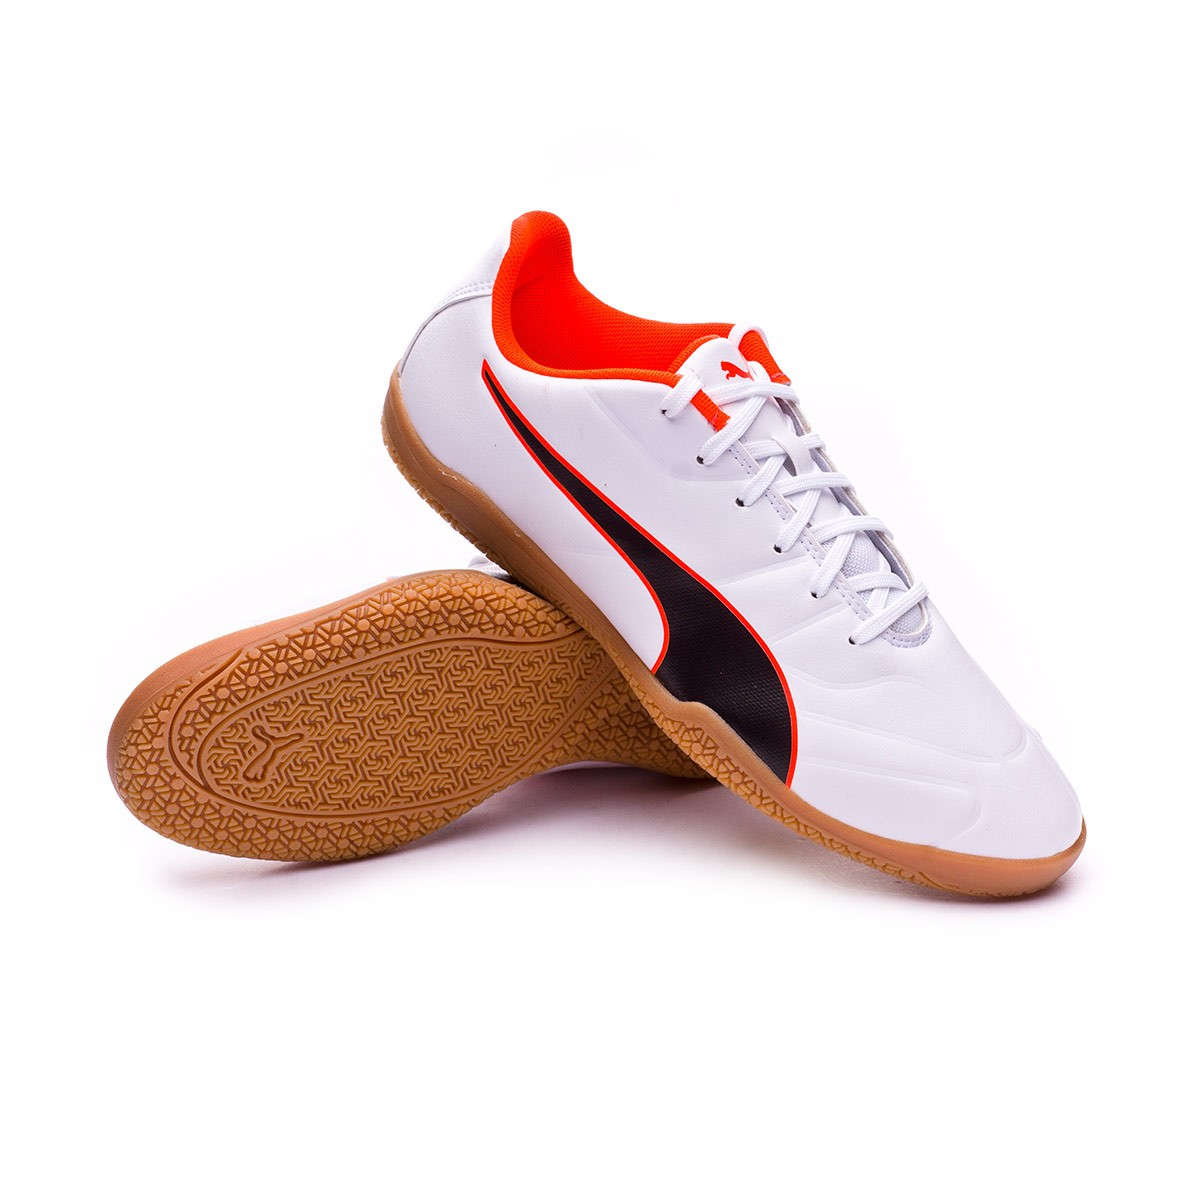 37e02c43 Futsal Boot Puma Kids Classico C II Sala Puma white-Puma black ...